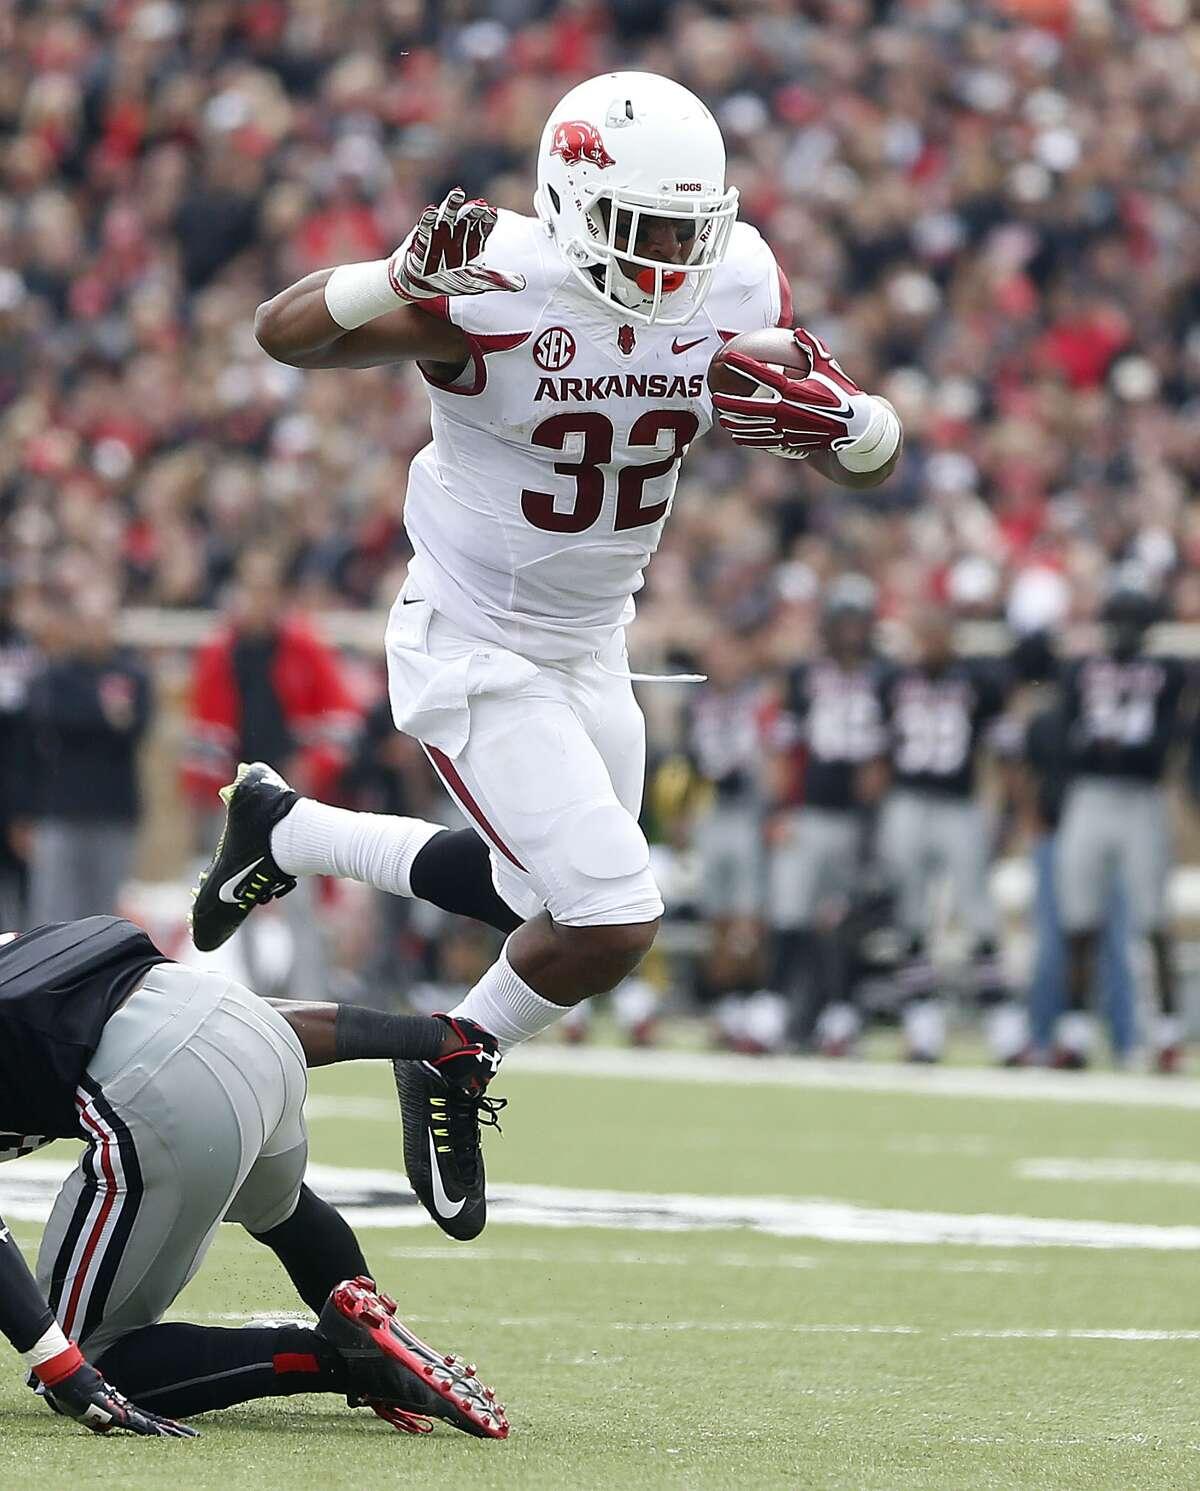 Arkansas' Jonathan Williams scores a touchdown against Texas Tech during an NCAA college football game in Lubbock, Texas, Saturday, Sept. 13, 2014.